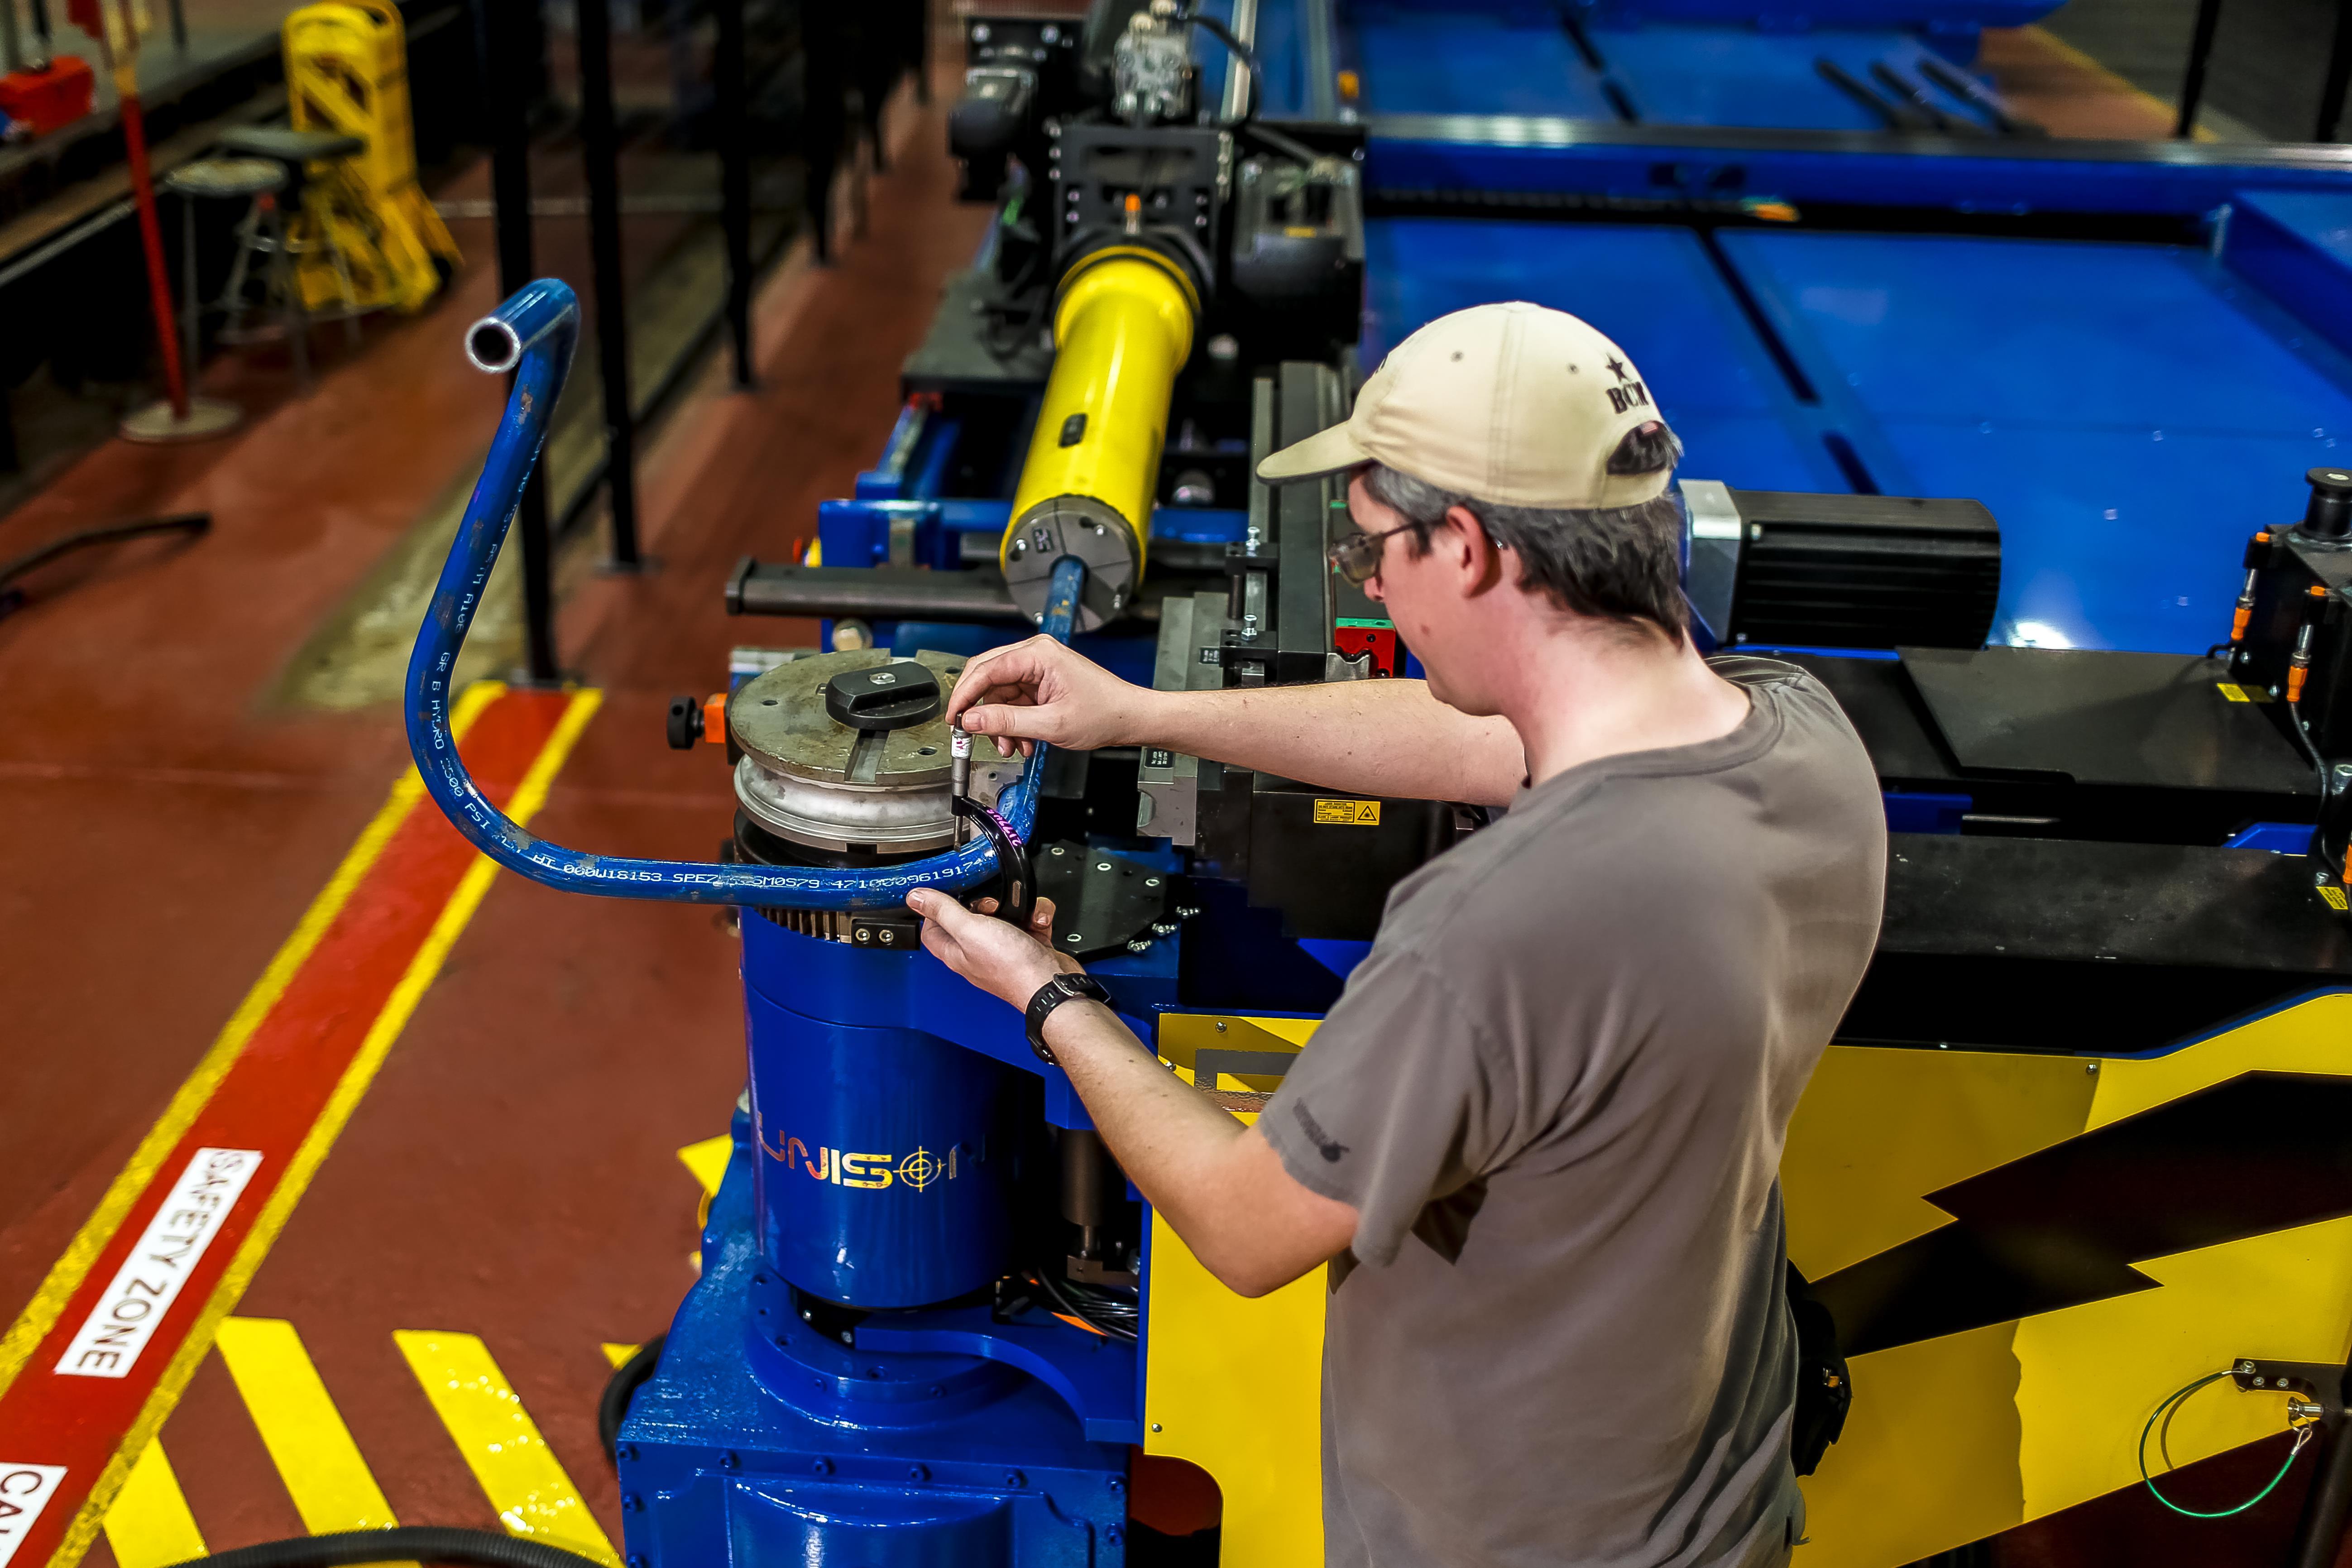 Norfolk Naval Shipyard S New Pipe Bending Machine Saves